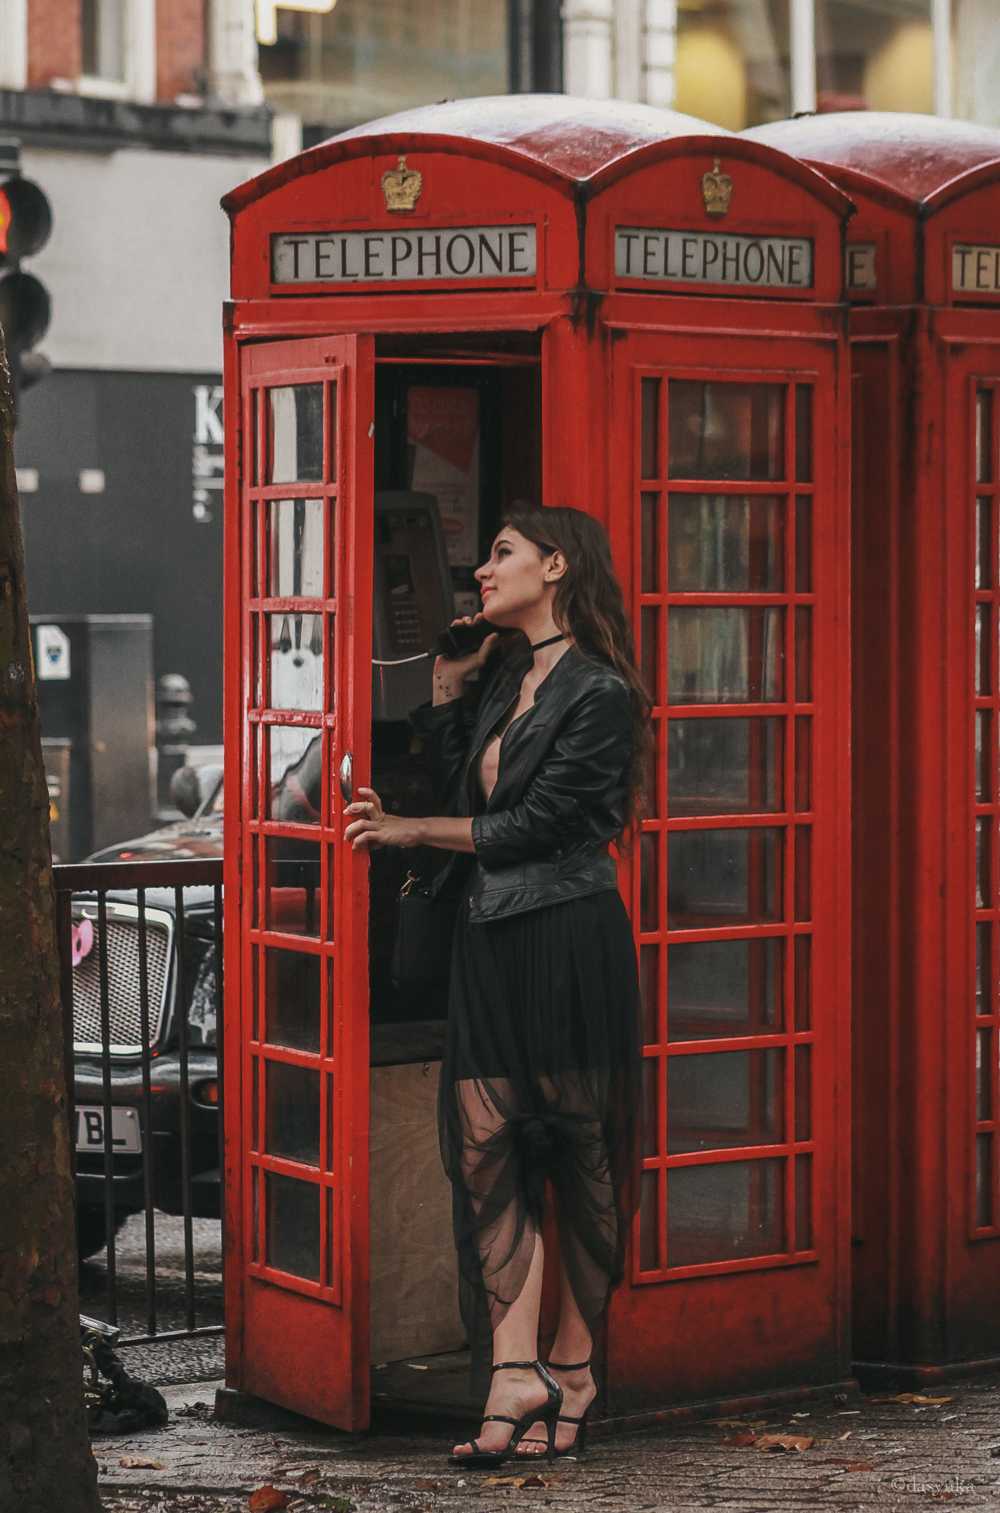 dasynka-fashion-blogger-london-life-street-style-big-ben-pinterest-skirt-pink-black-bag-white-look-leather-jacket-skirt-long-hair-zara-hm-asos-hermes-satin-heels-choker